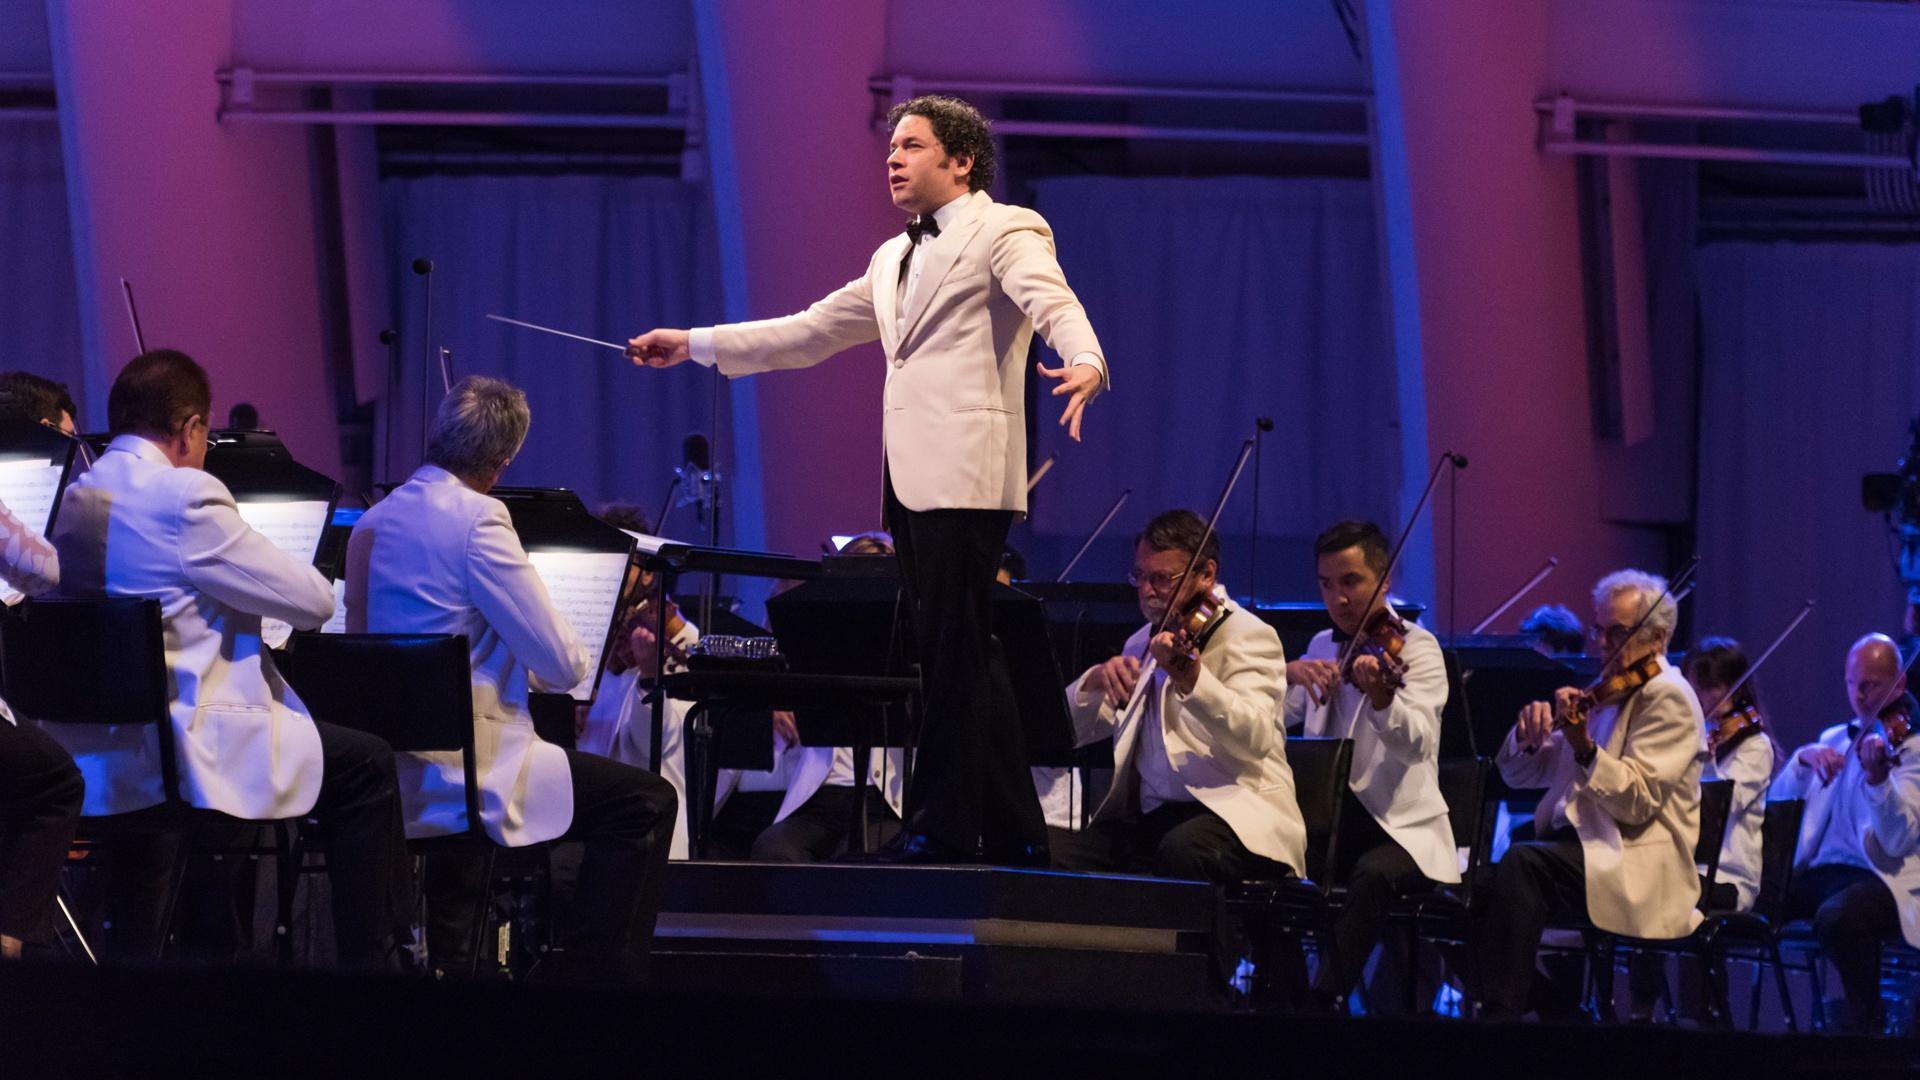 Adios nonino | Dudamel Conducts Tangos Under The Stars